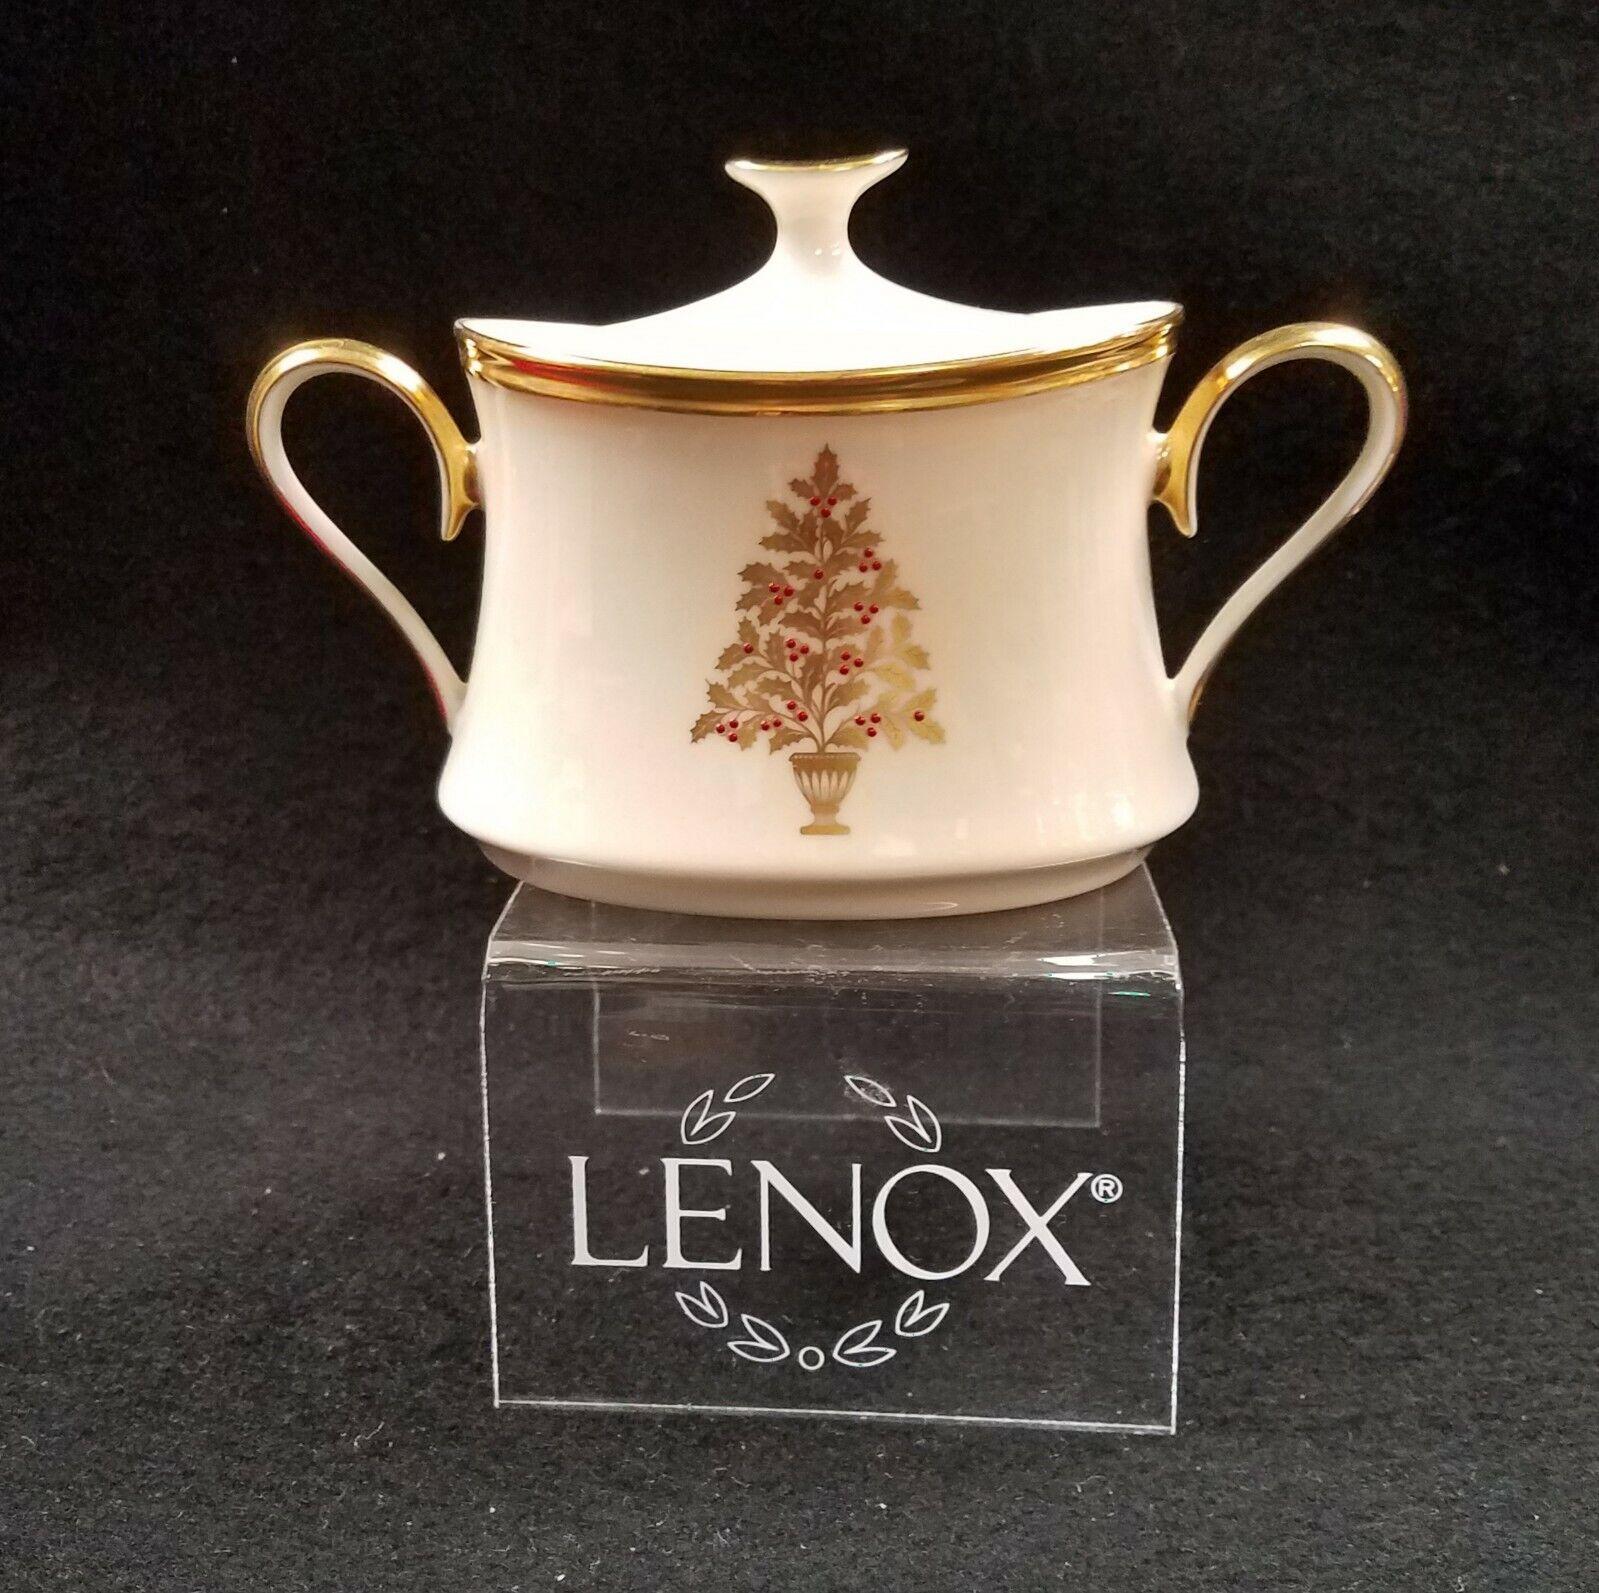 LENOX Eternal Christmas Sugar Lid - $119.95